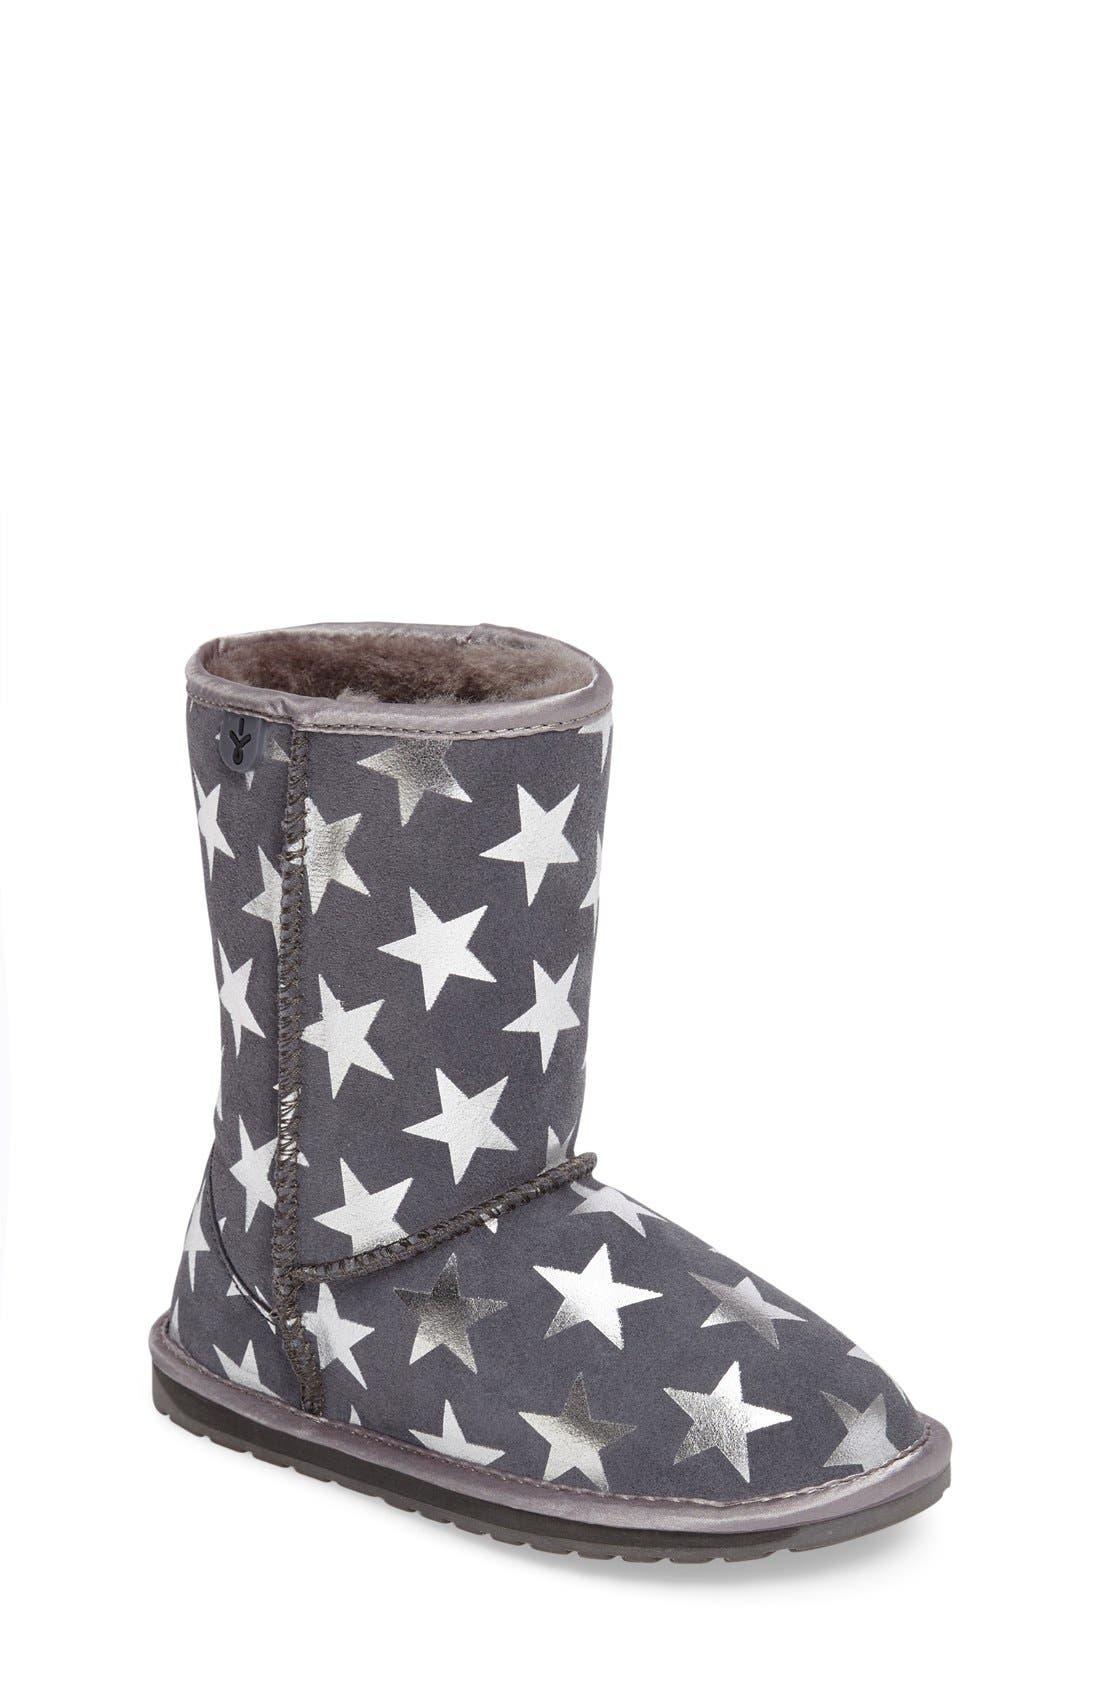 Main Image - EMUAustralia 'Starry Night' Boot (Toddler, Little Kid & Big Kid)